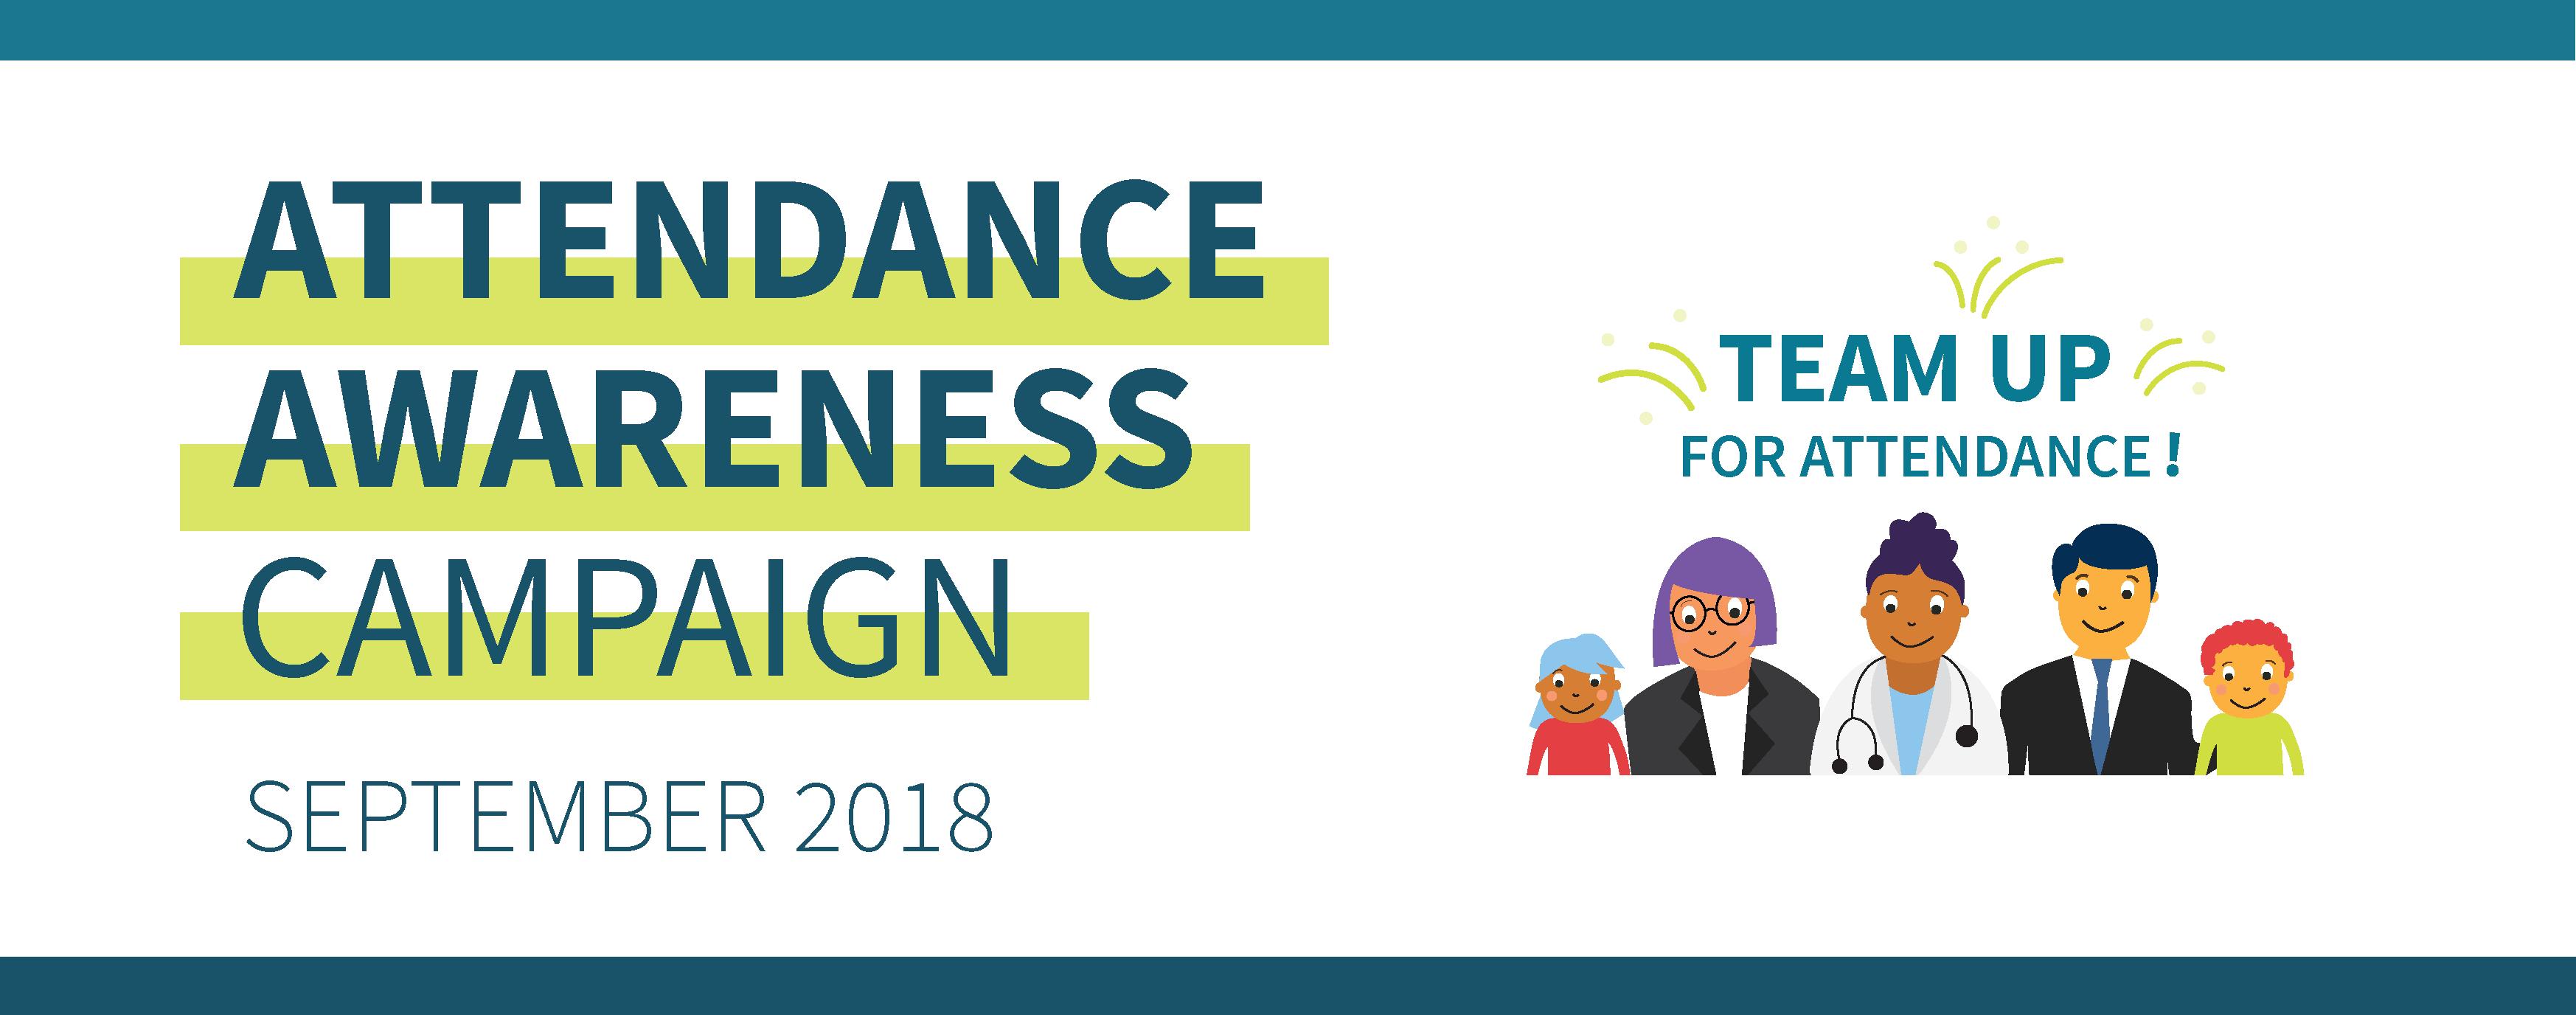 social media tools attendance awareness month 2018